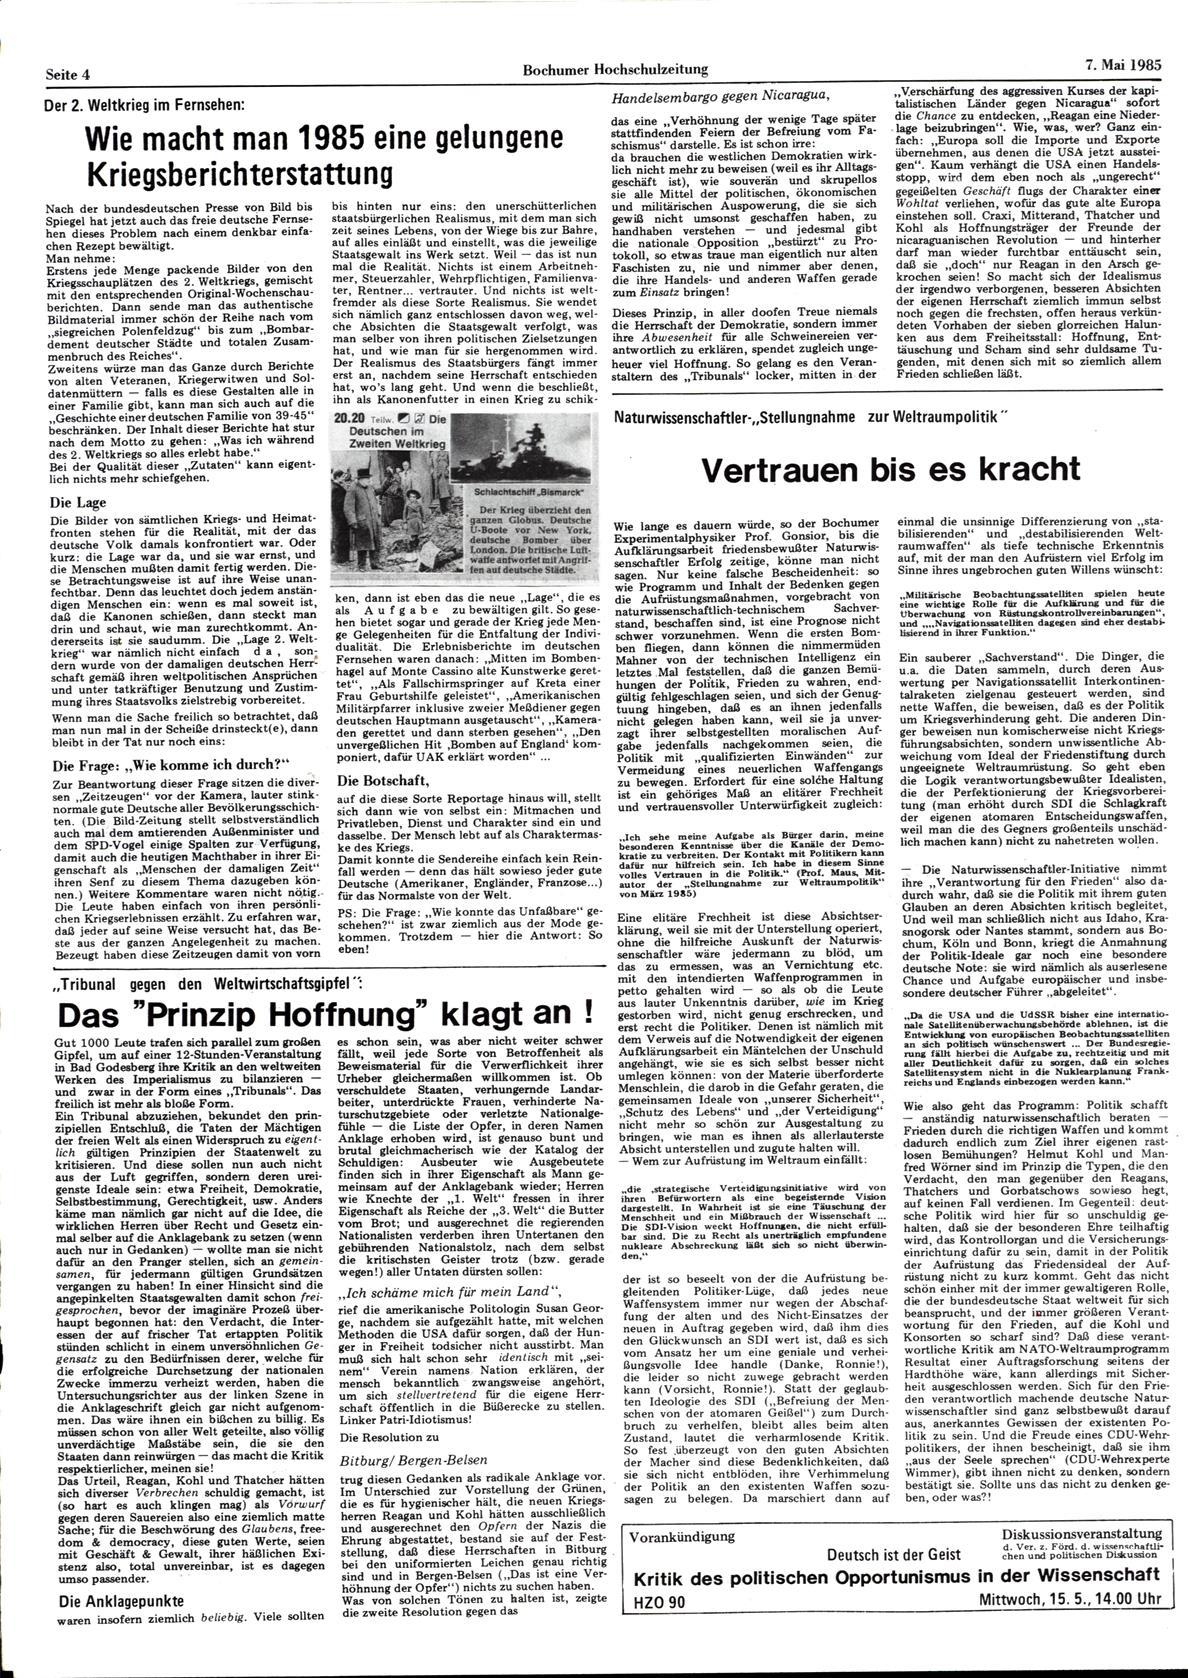 Bochum_BHZ_19850506_109_004